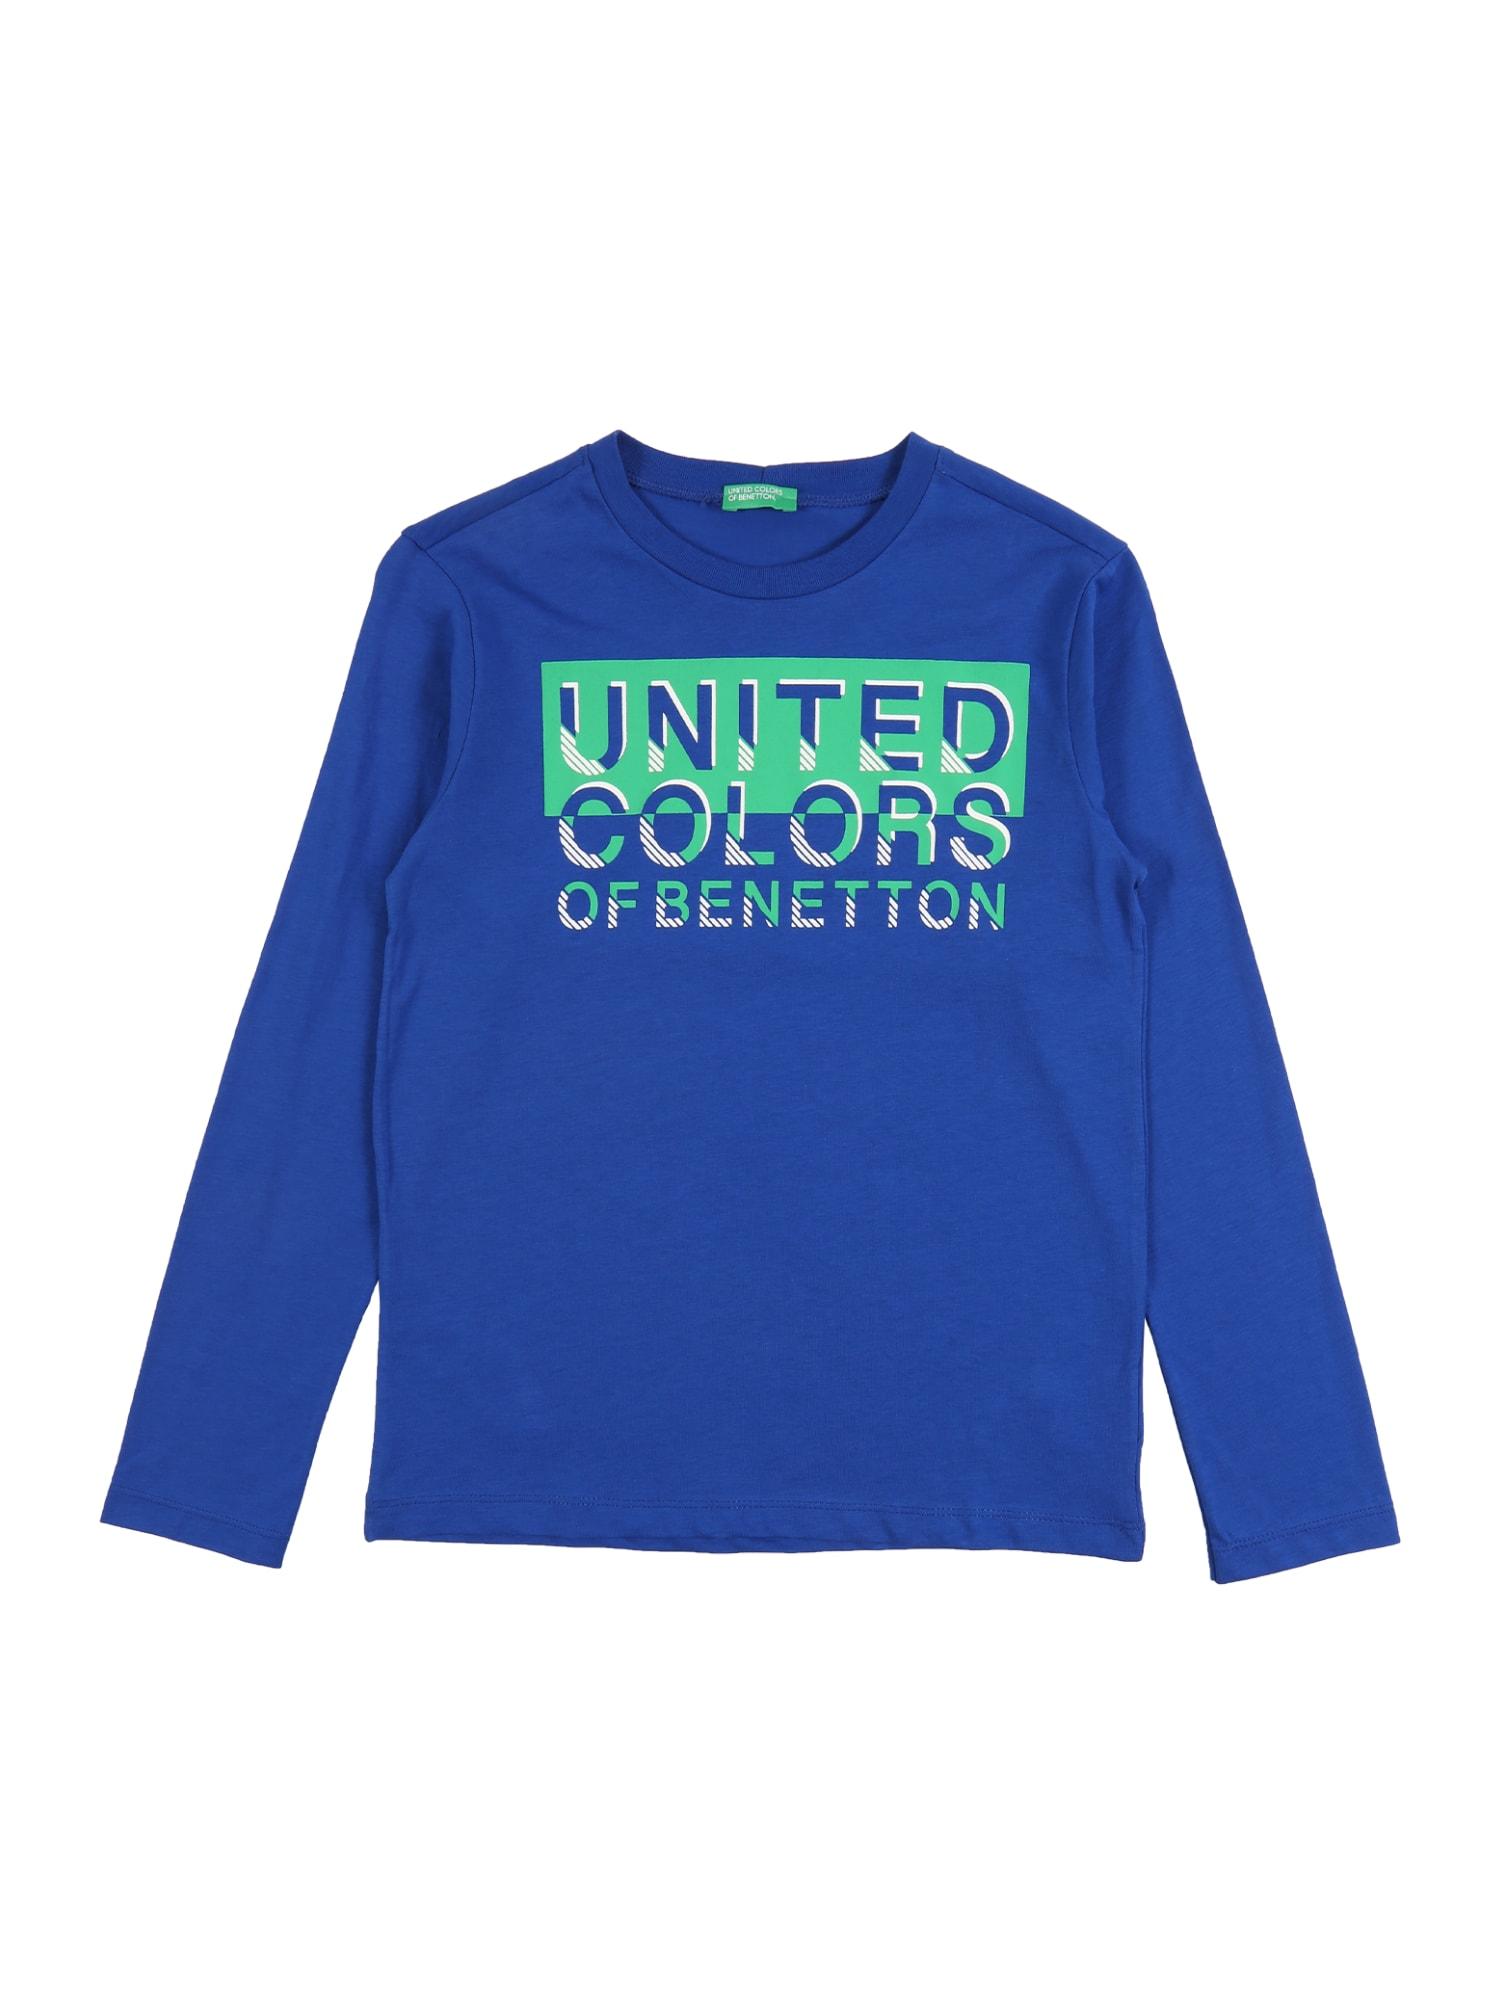 UNITED COLORS OF BENETTON Marškinėliai 'T-SHIRT L/S' mėlyna